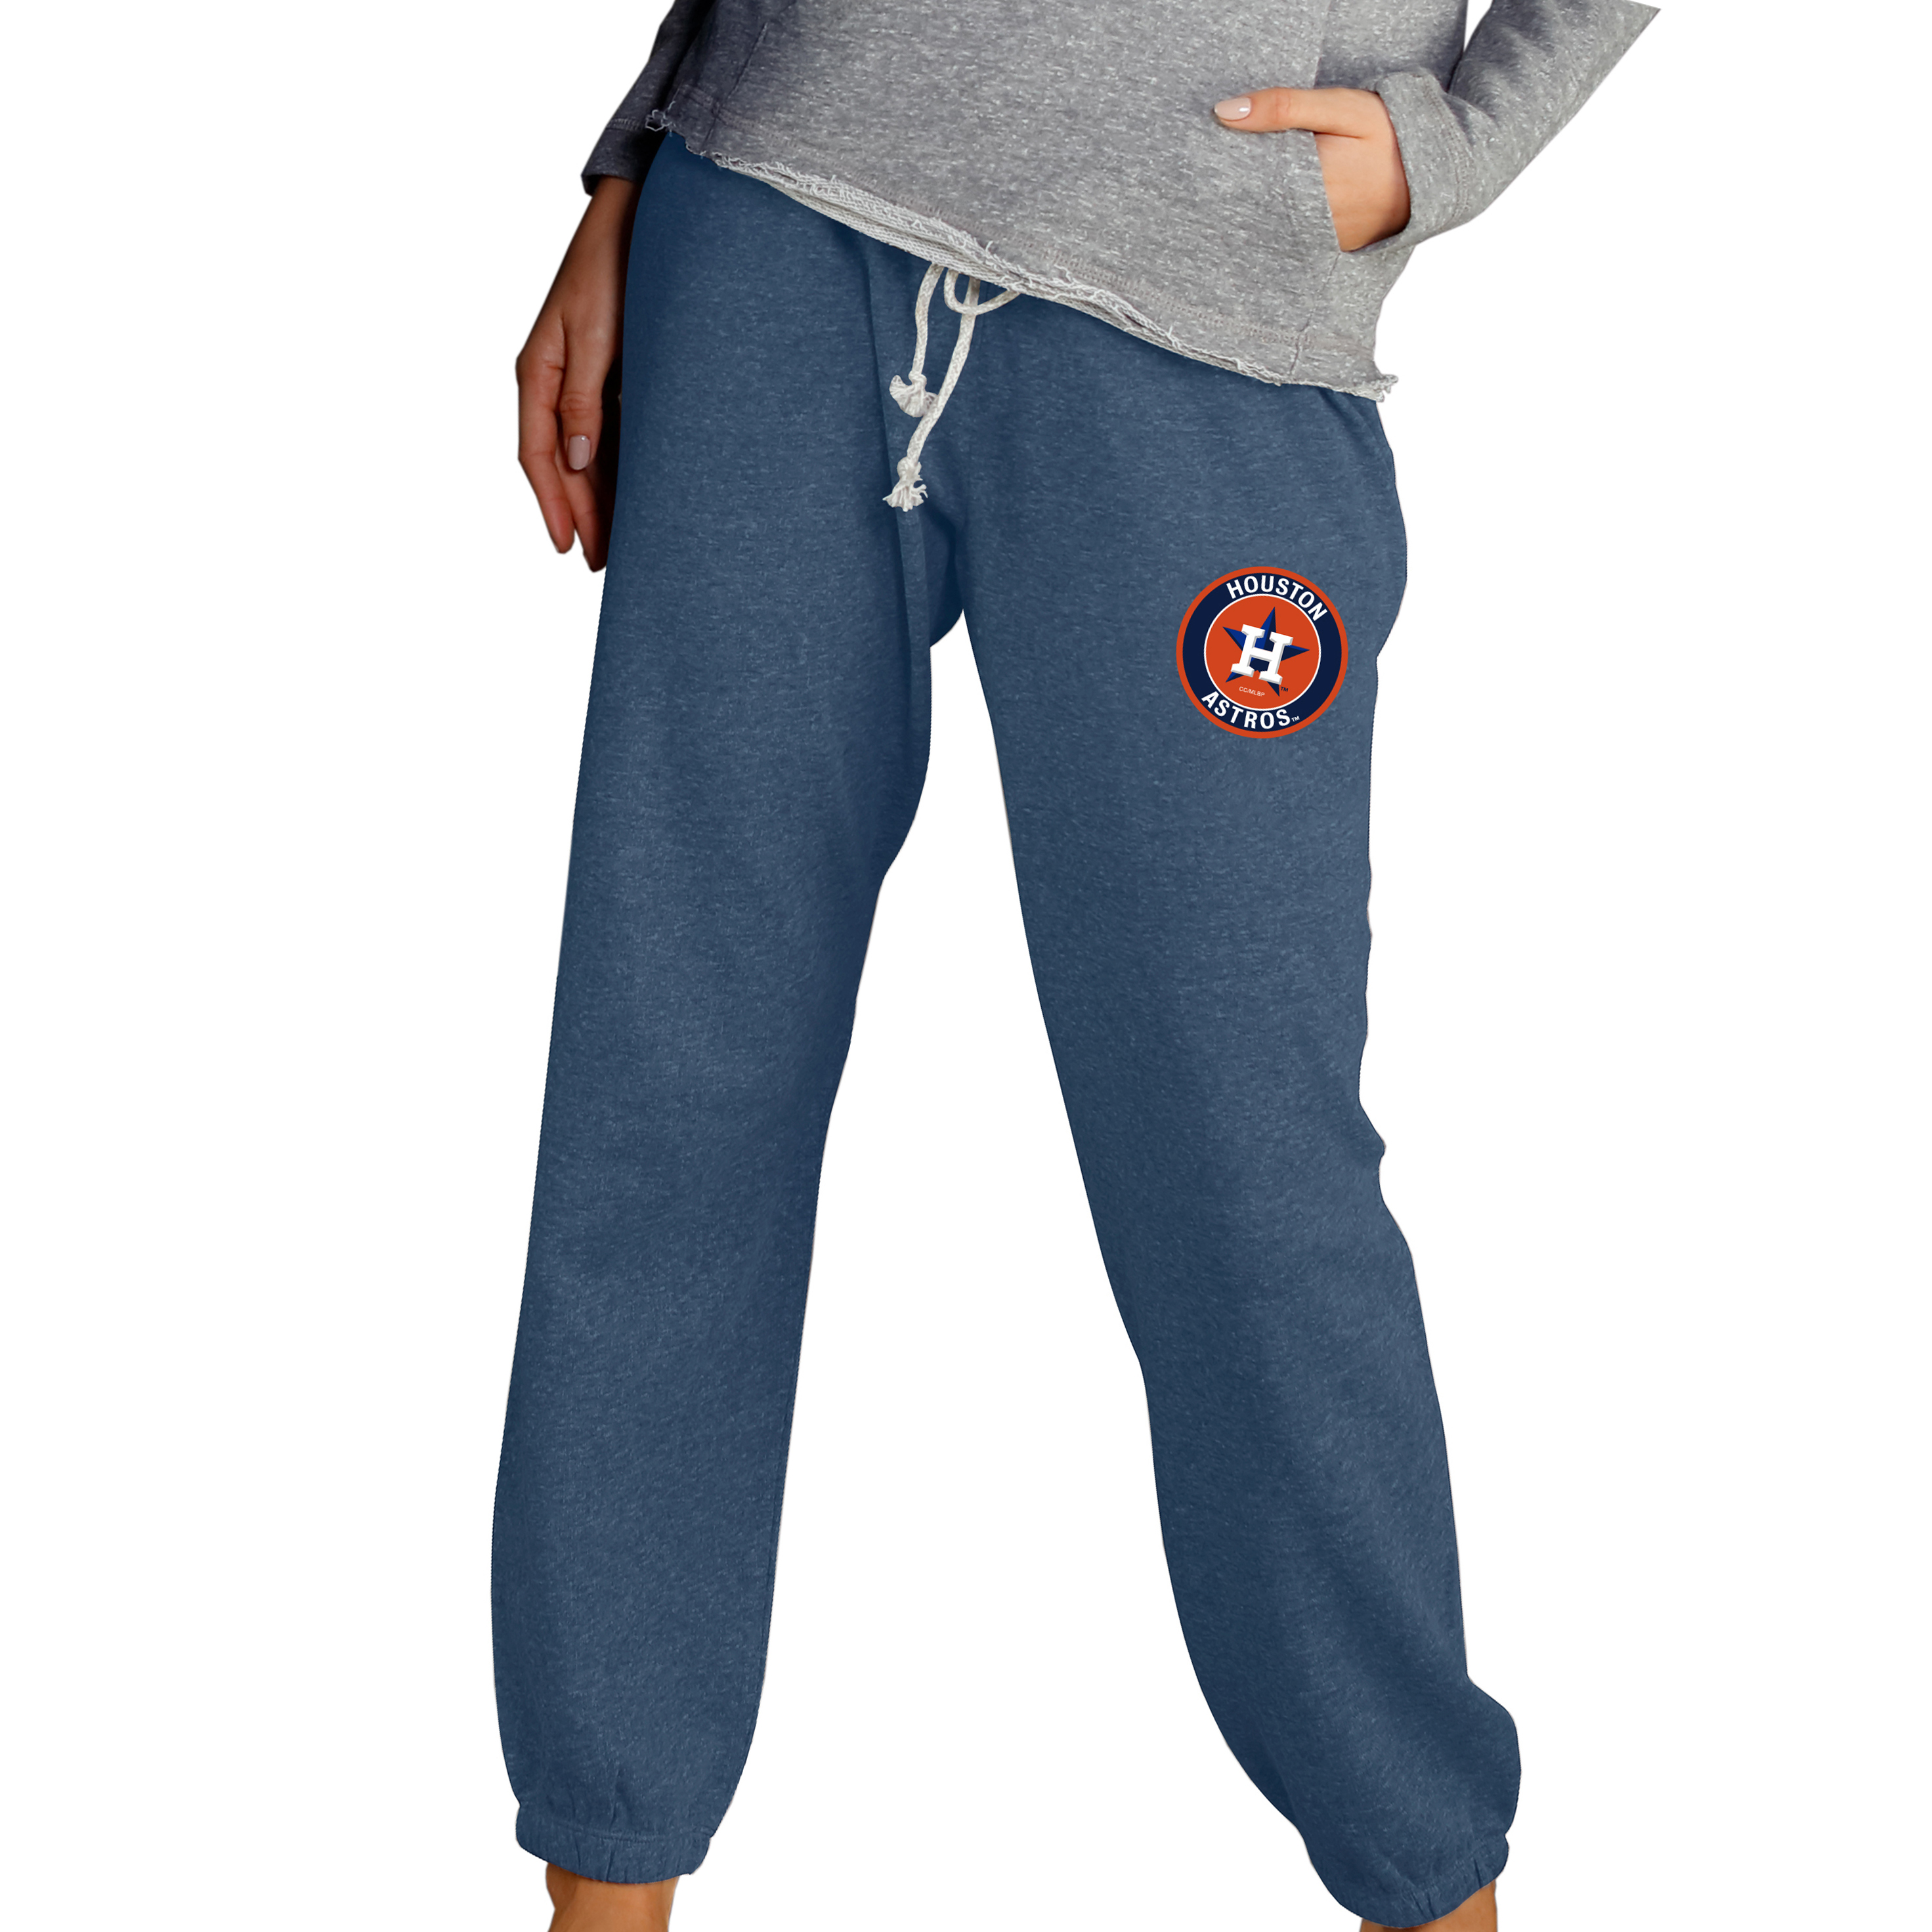 Houston Astros Concepts Sport Women's Mainstream Knit Pants - Navy